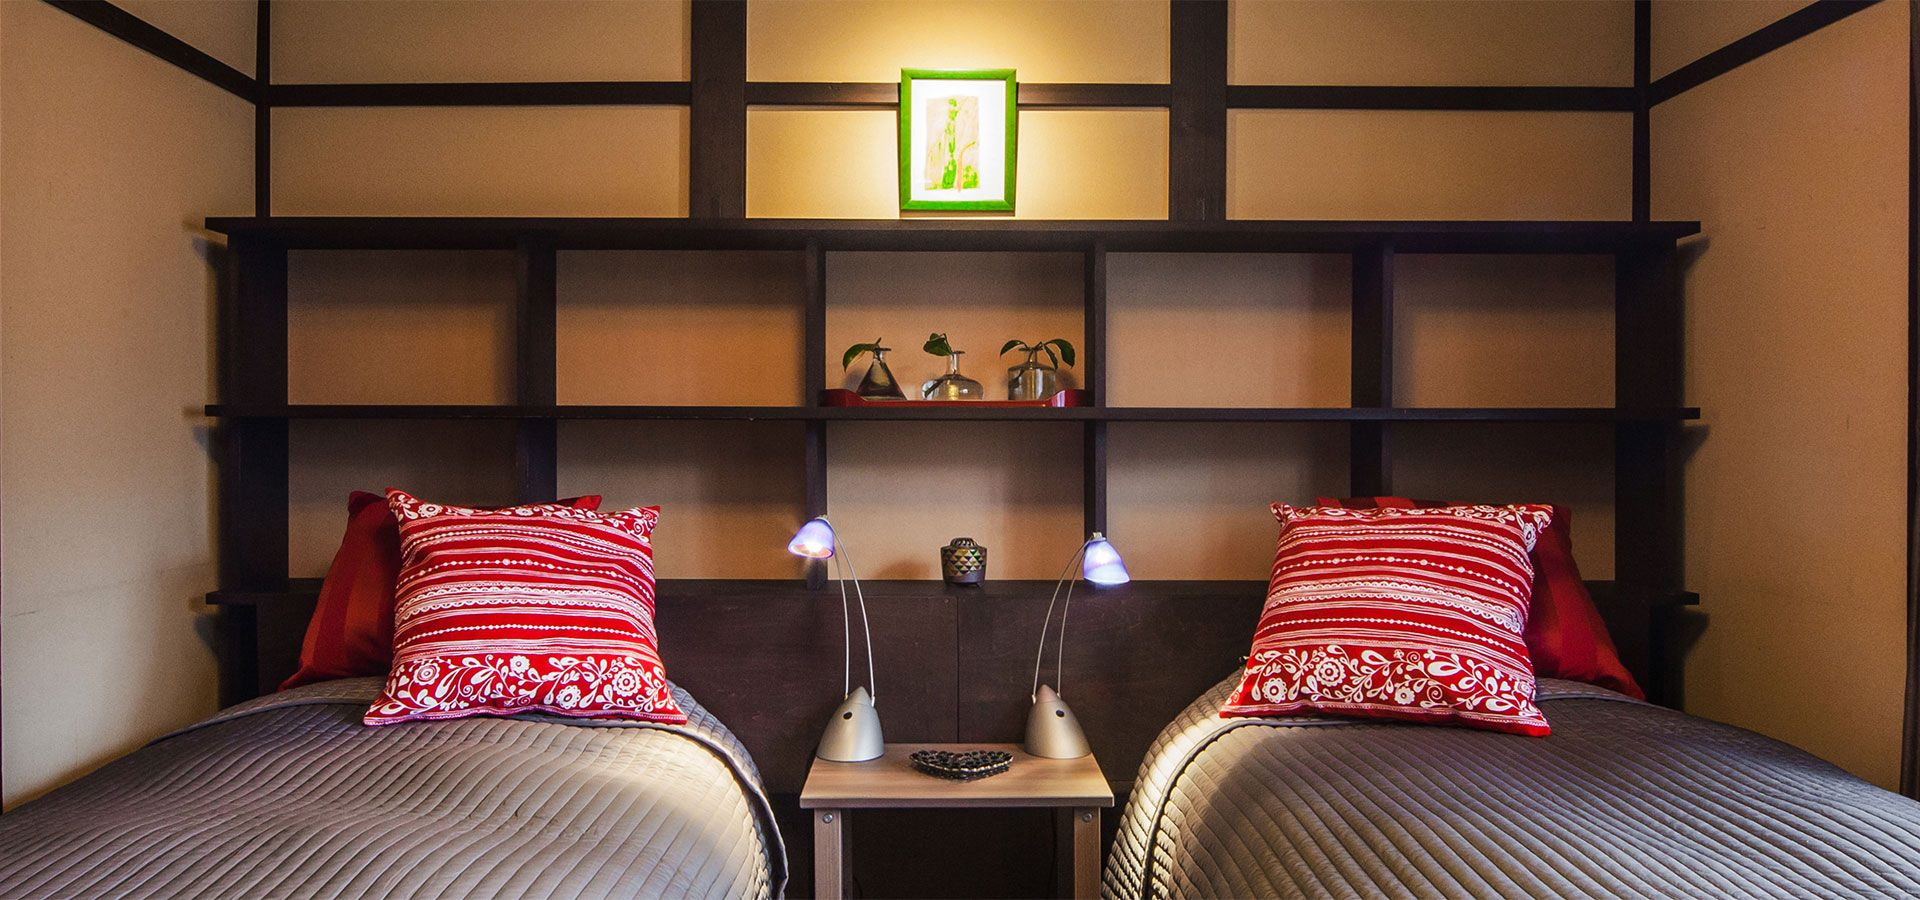 airbnb paris va obliger les propri taires loueurs s 39 enregistrer d s octobre batinfo. Black Bedroom Furniture Sets. Home Design Ideas